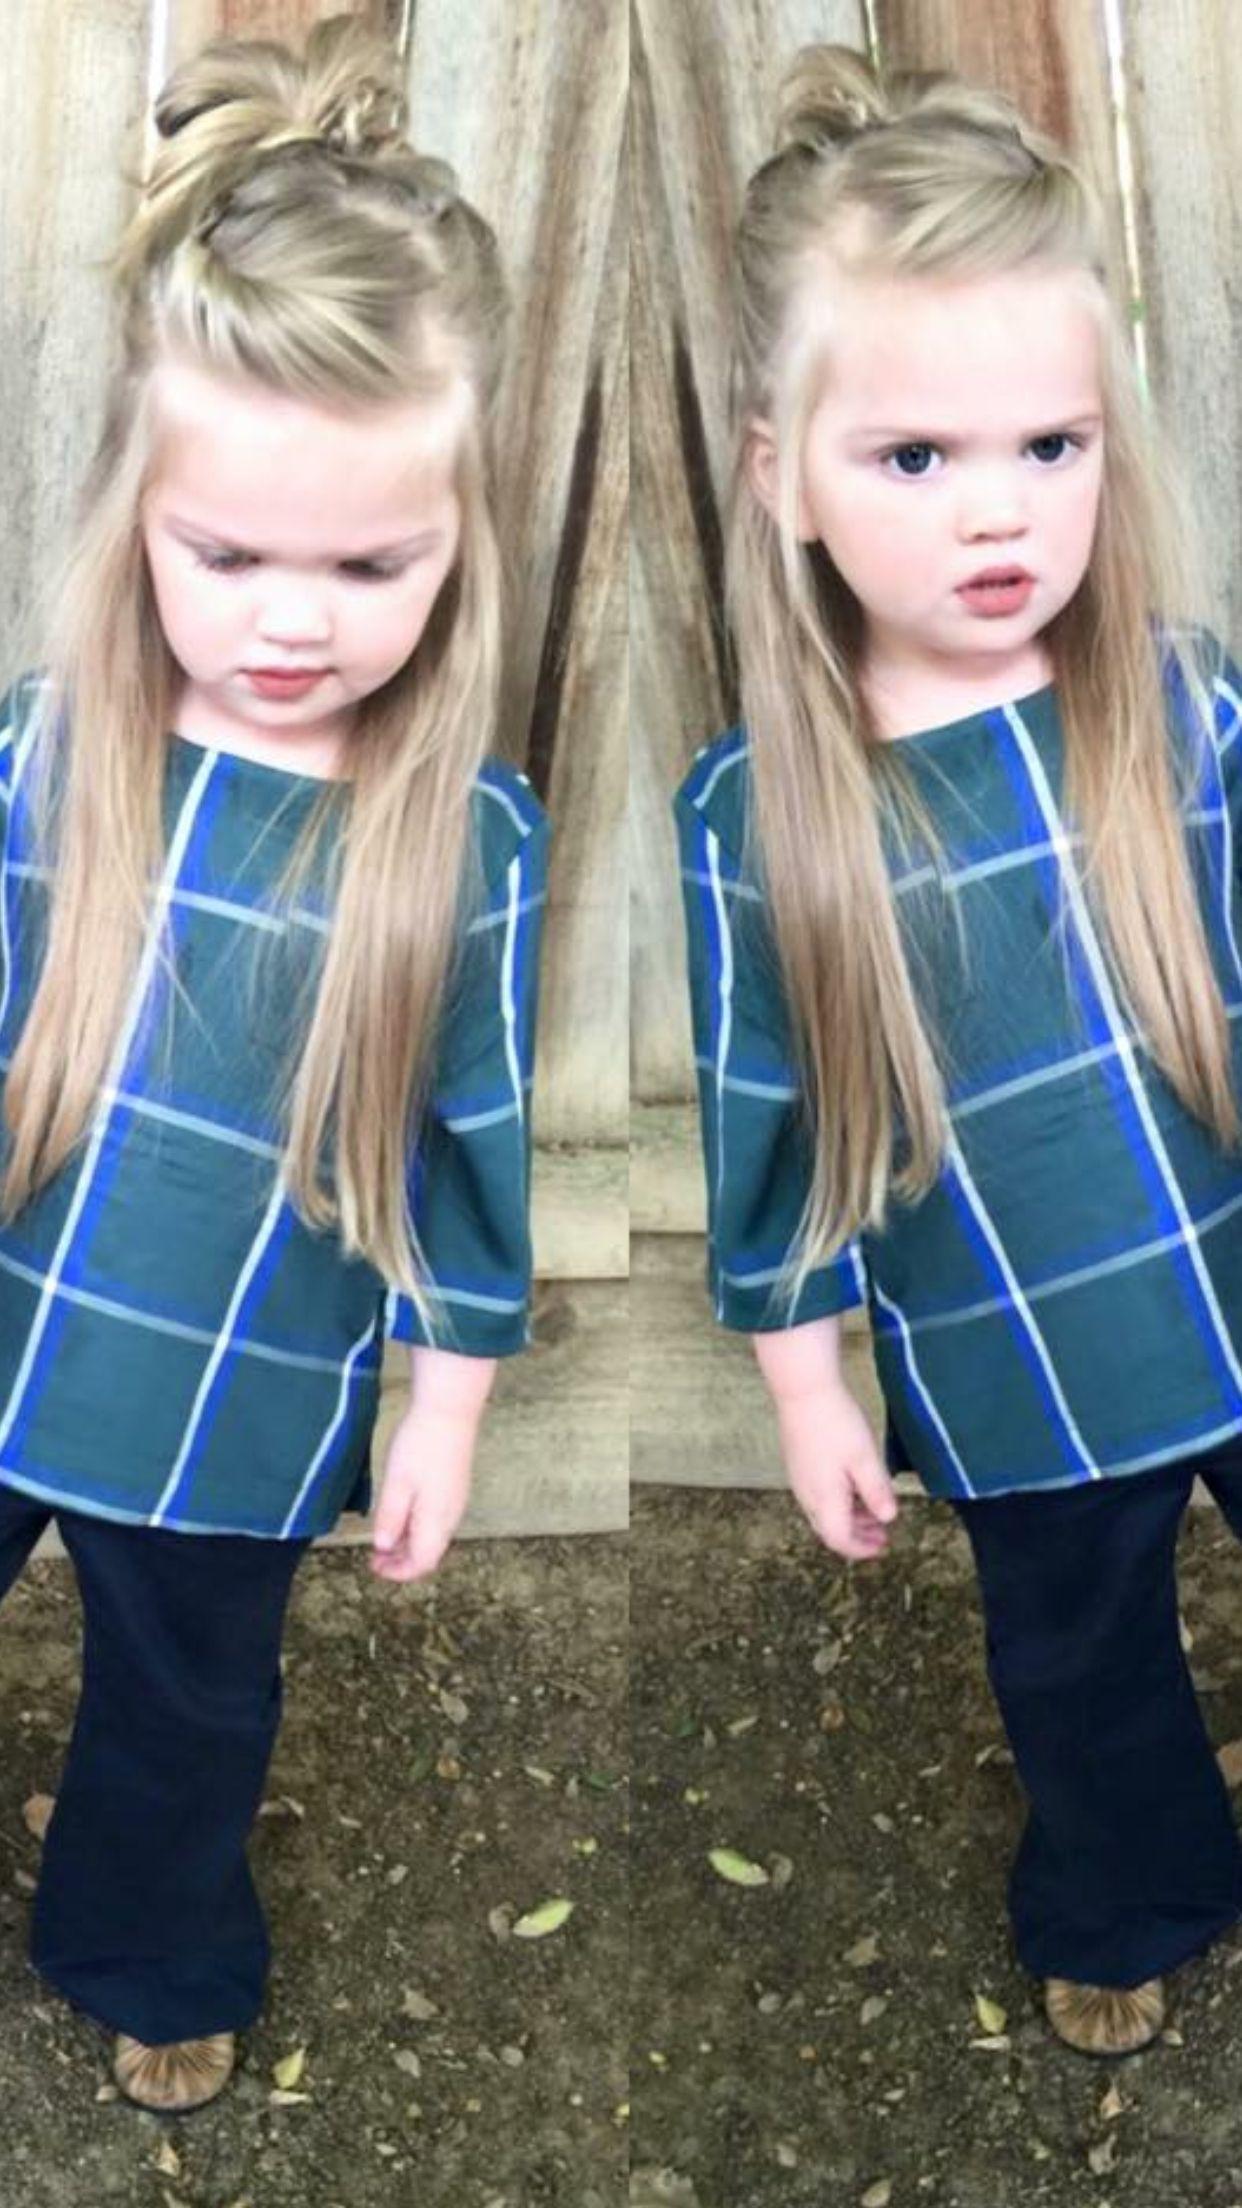 Little girl haircuts easyhairstylesforlittlegirls fashion